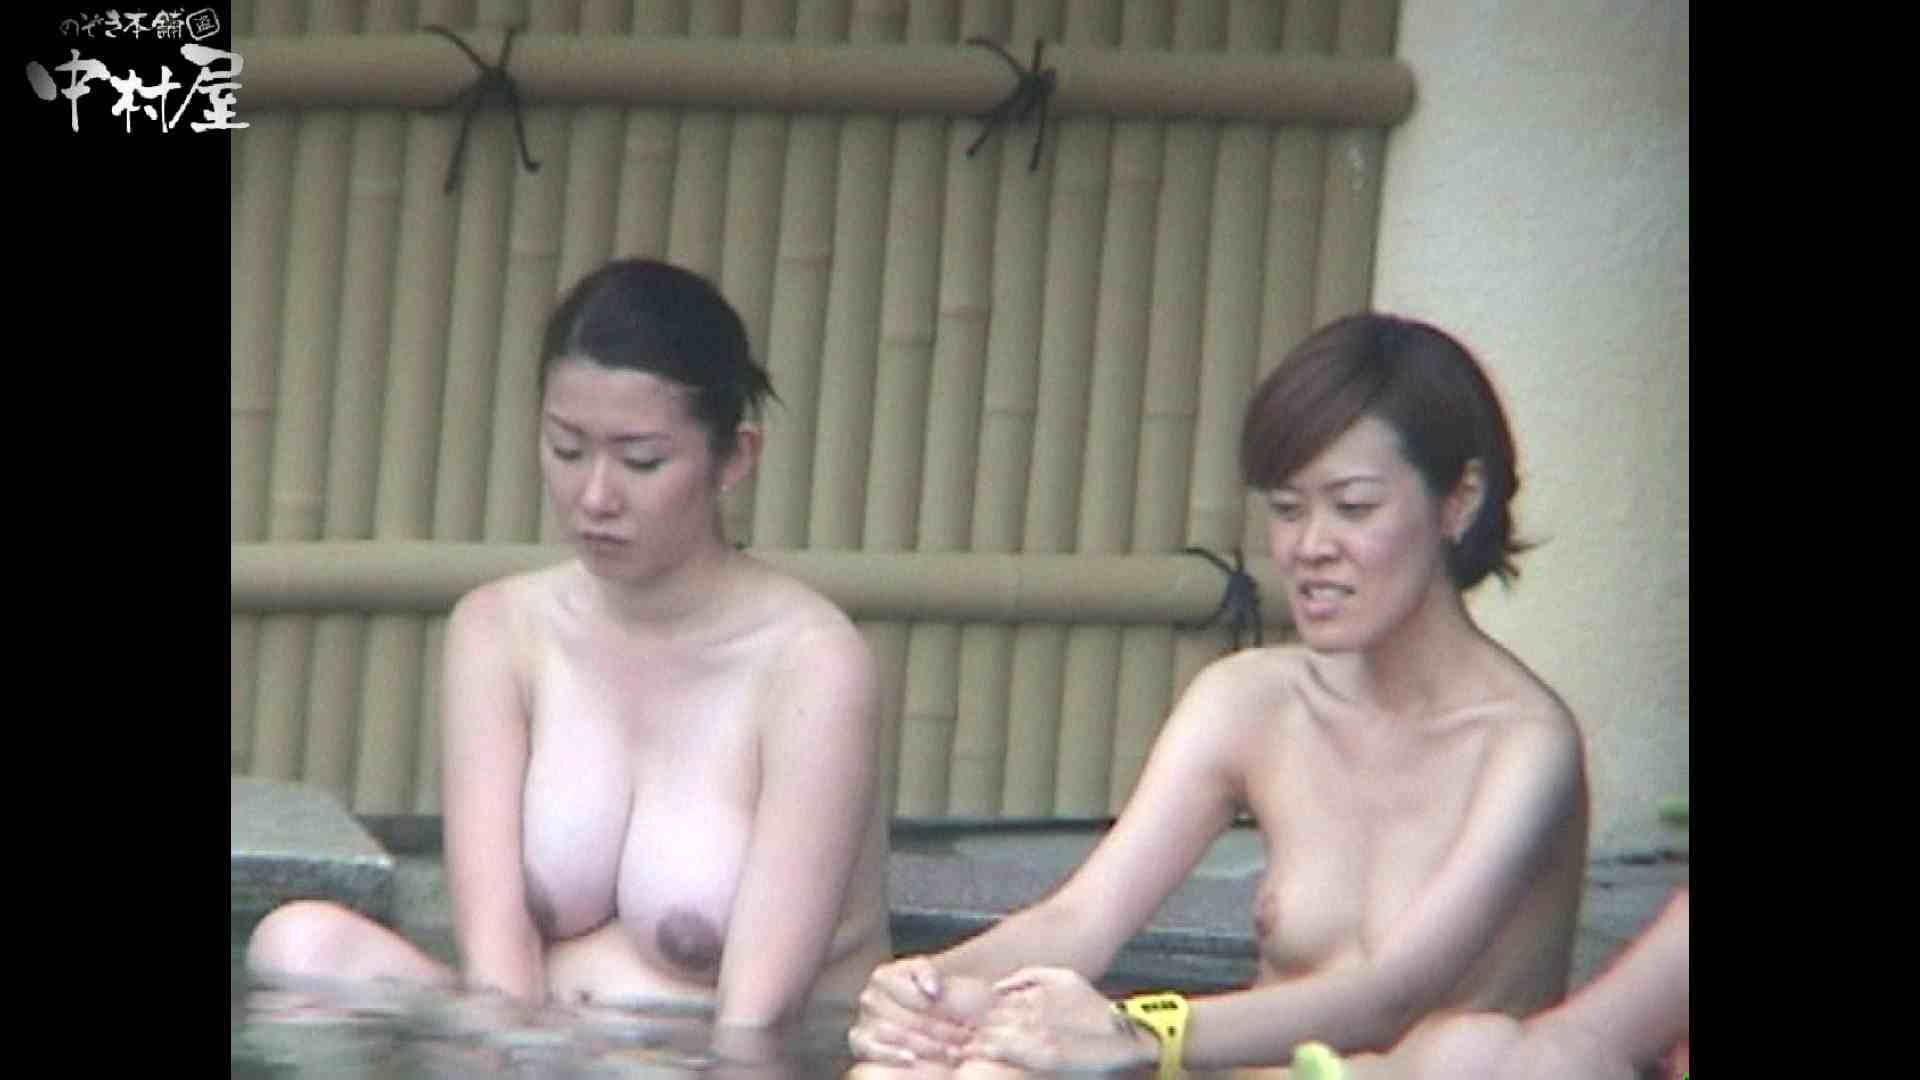 Aquaな露天風呂Vol.961 OL女体  65連発 15